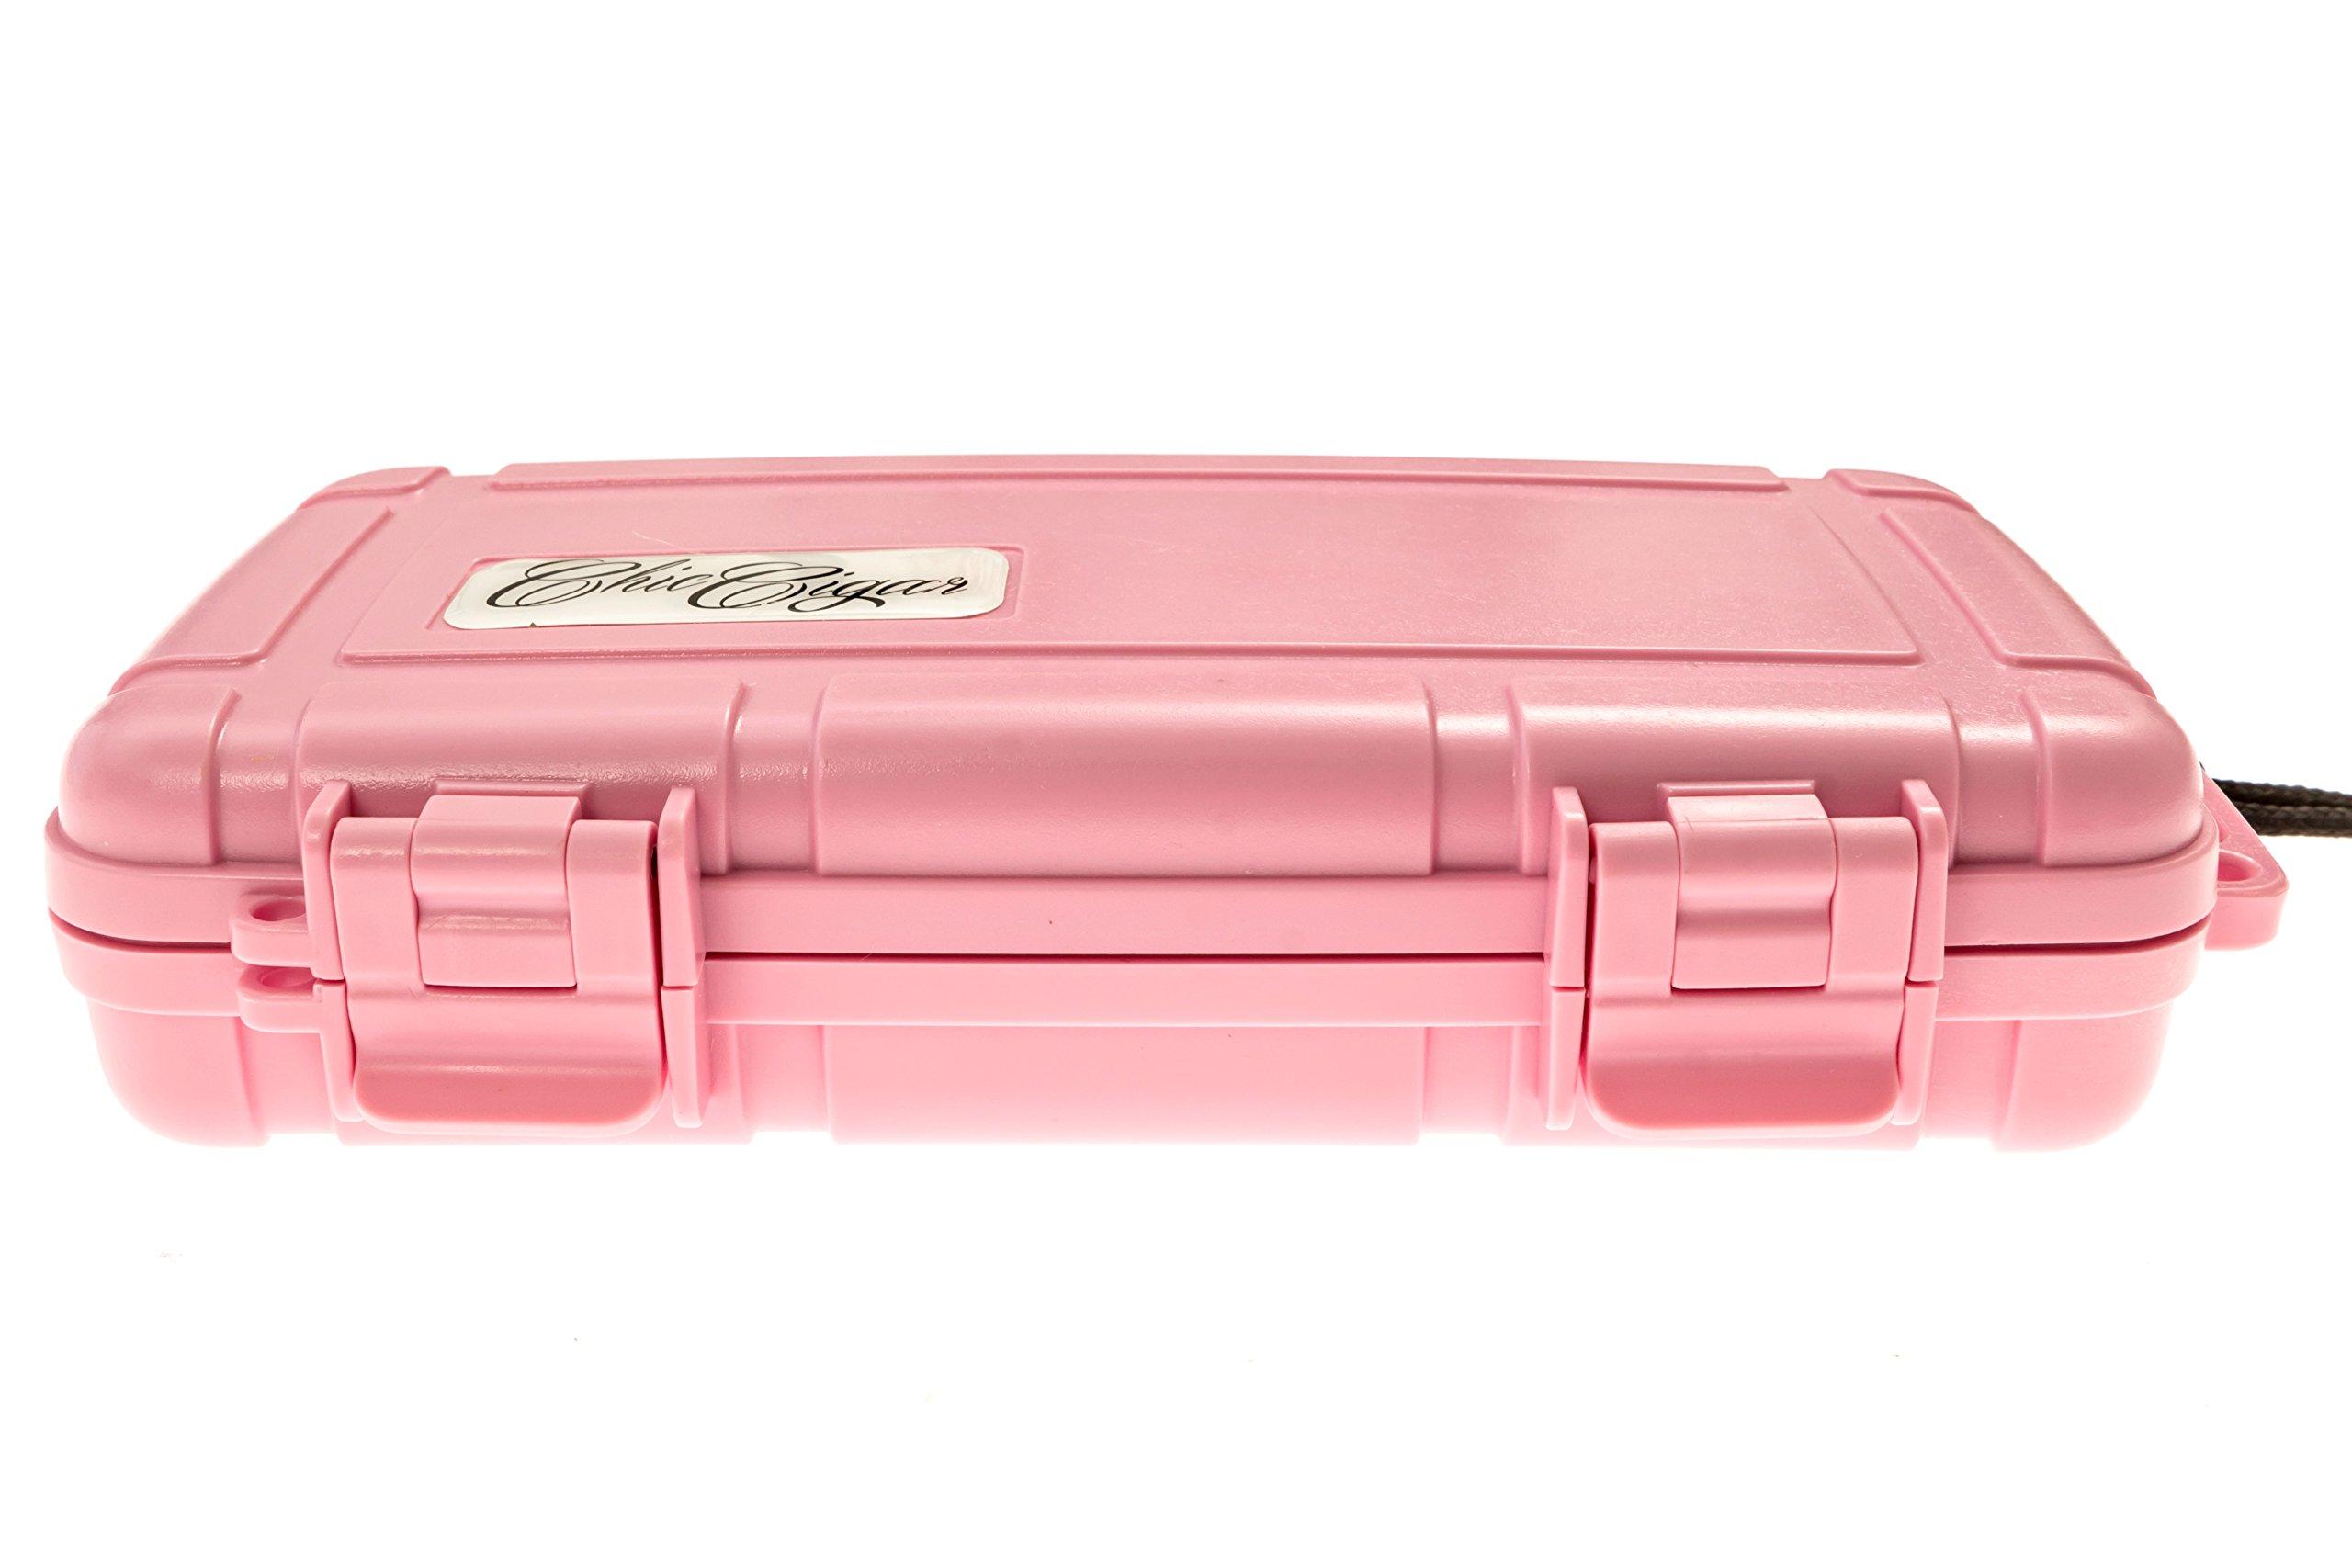 Chic Cigar Travel Humidor Case - Pink (5 Cigar) (Pink)